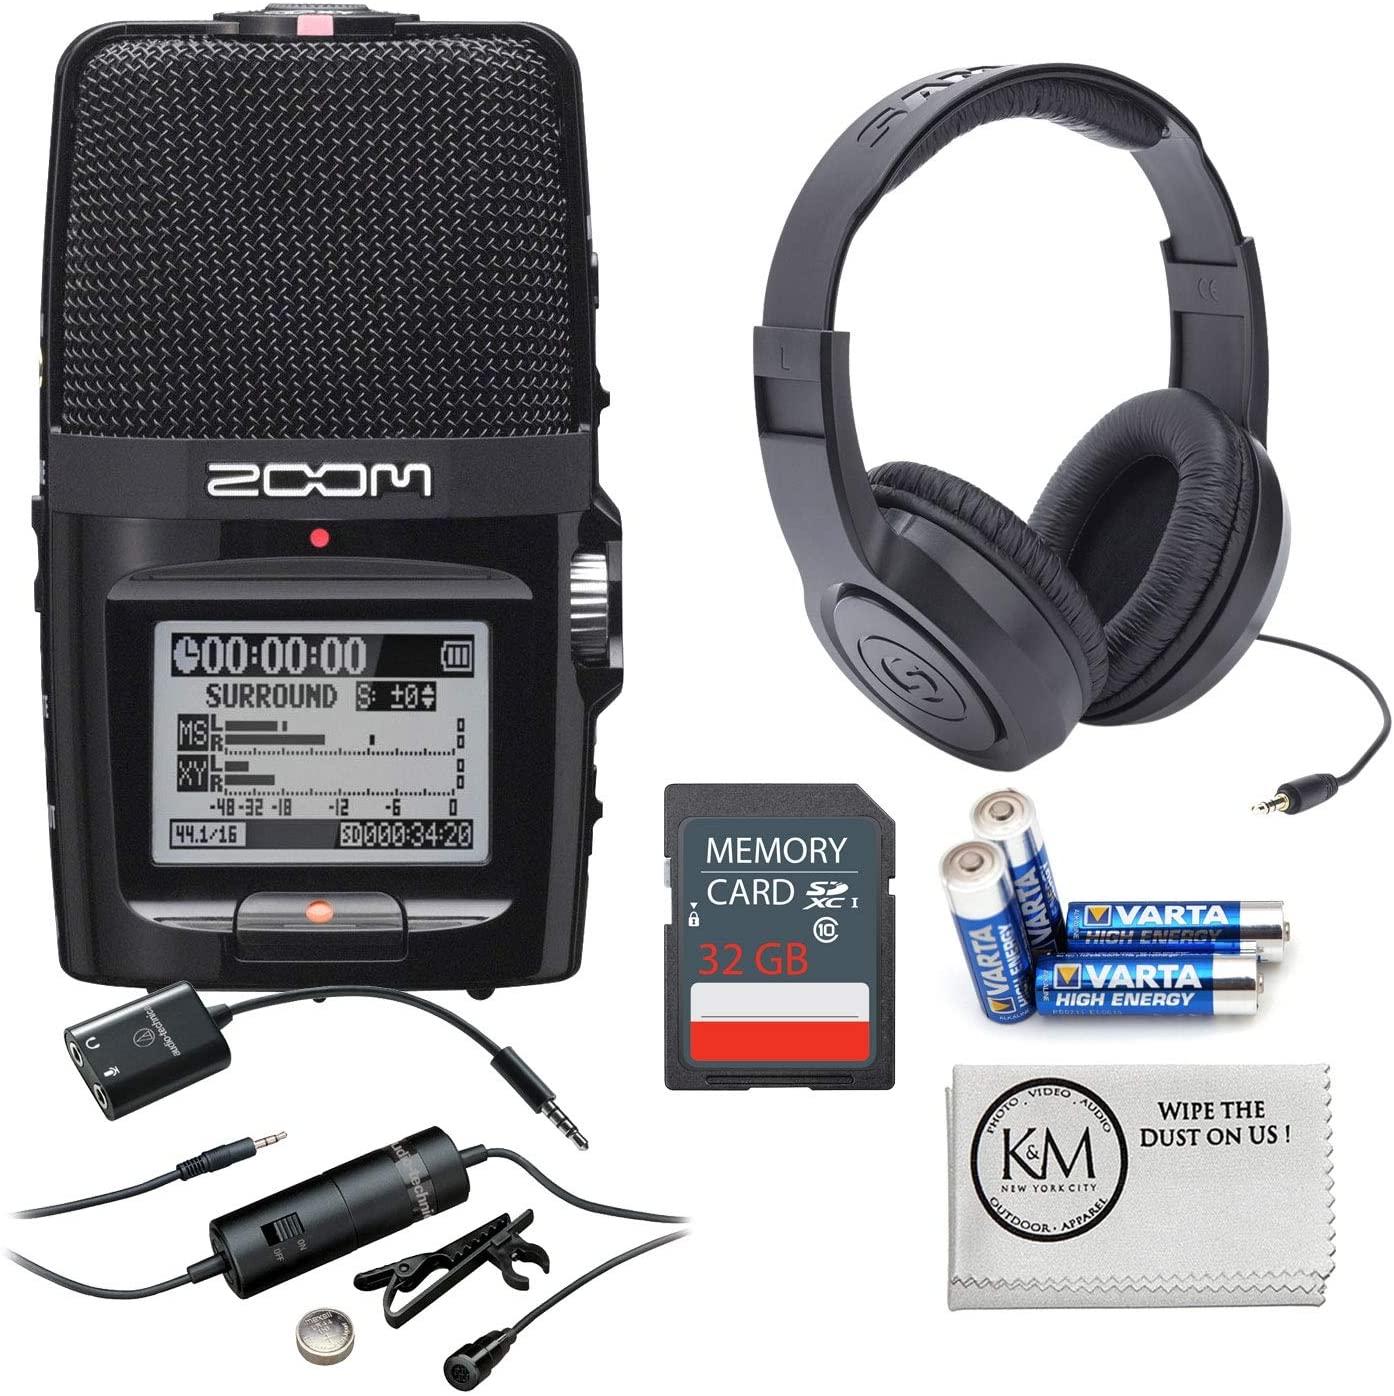 Zoom H2n Digital Recorder + 32GB SD Card + Headphones + Lavalier Microphone + K&M Micro Cloth